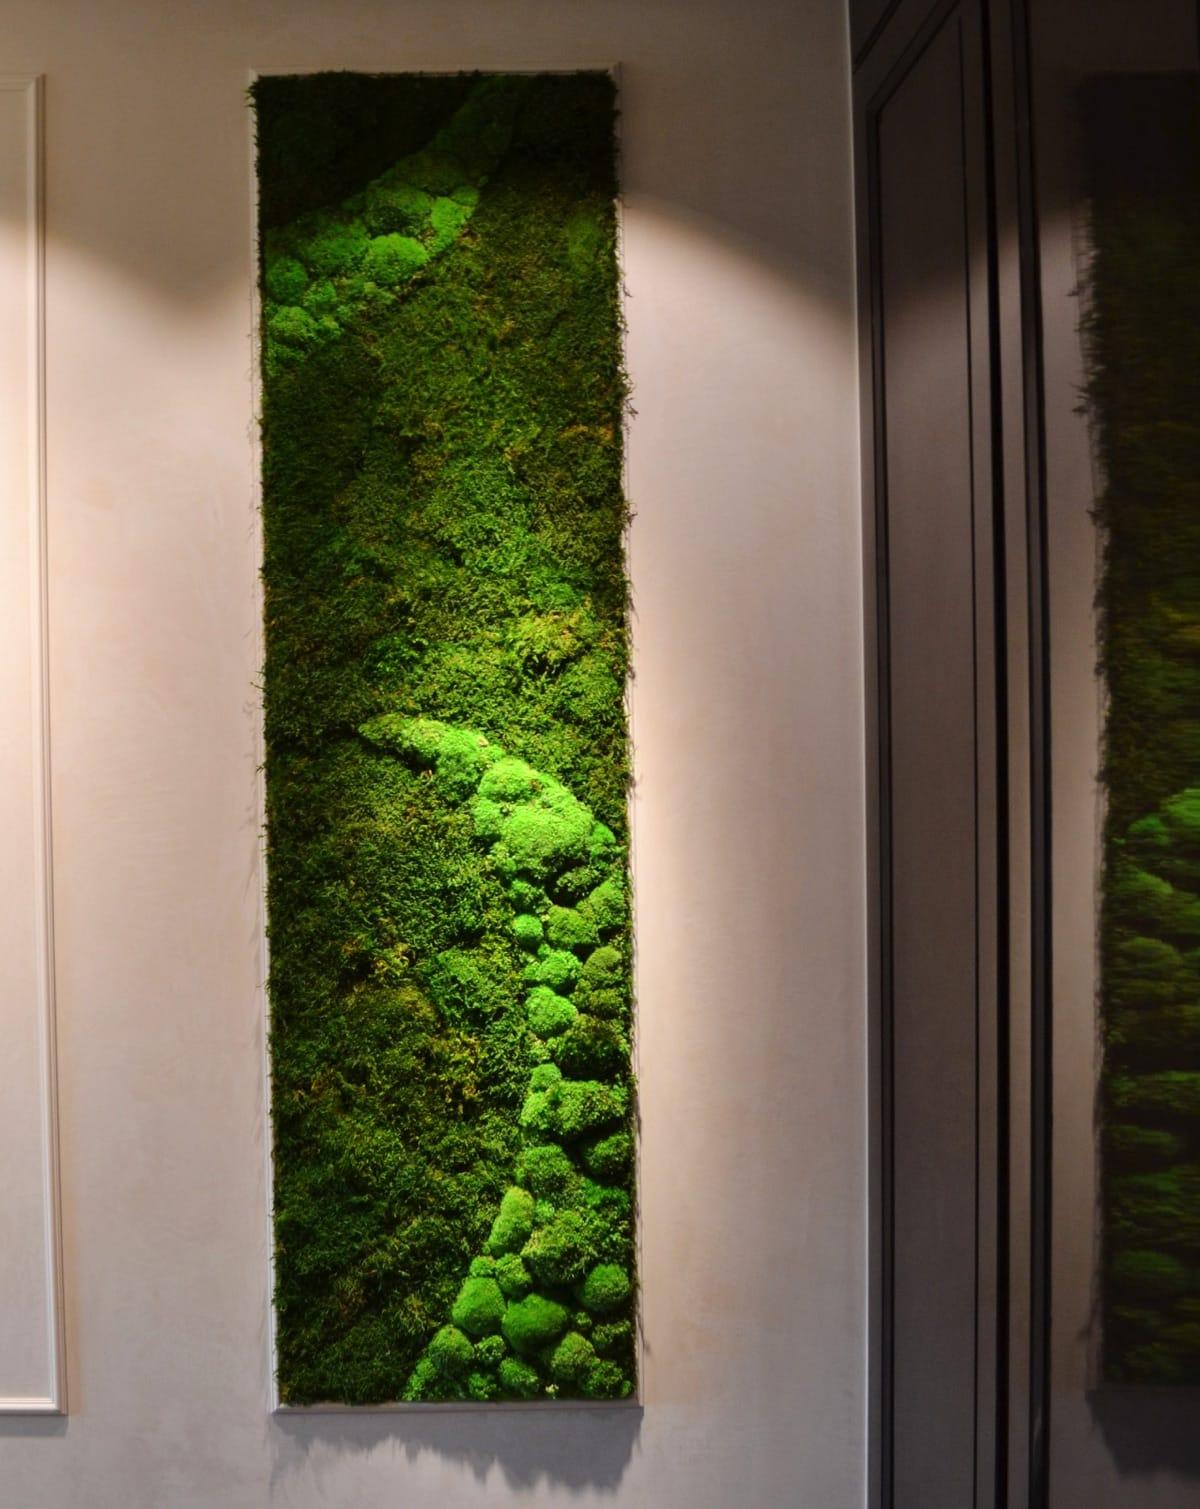 hibner-studio-zielone-sciany-006_1200